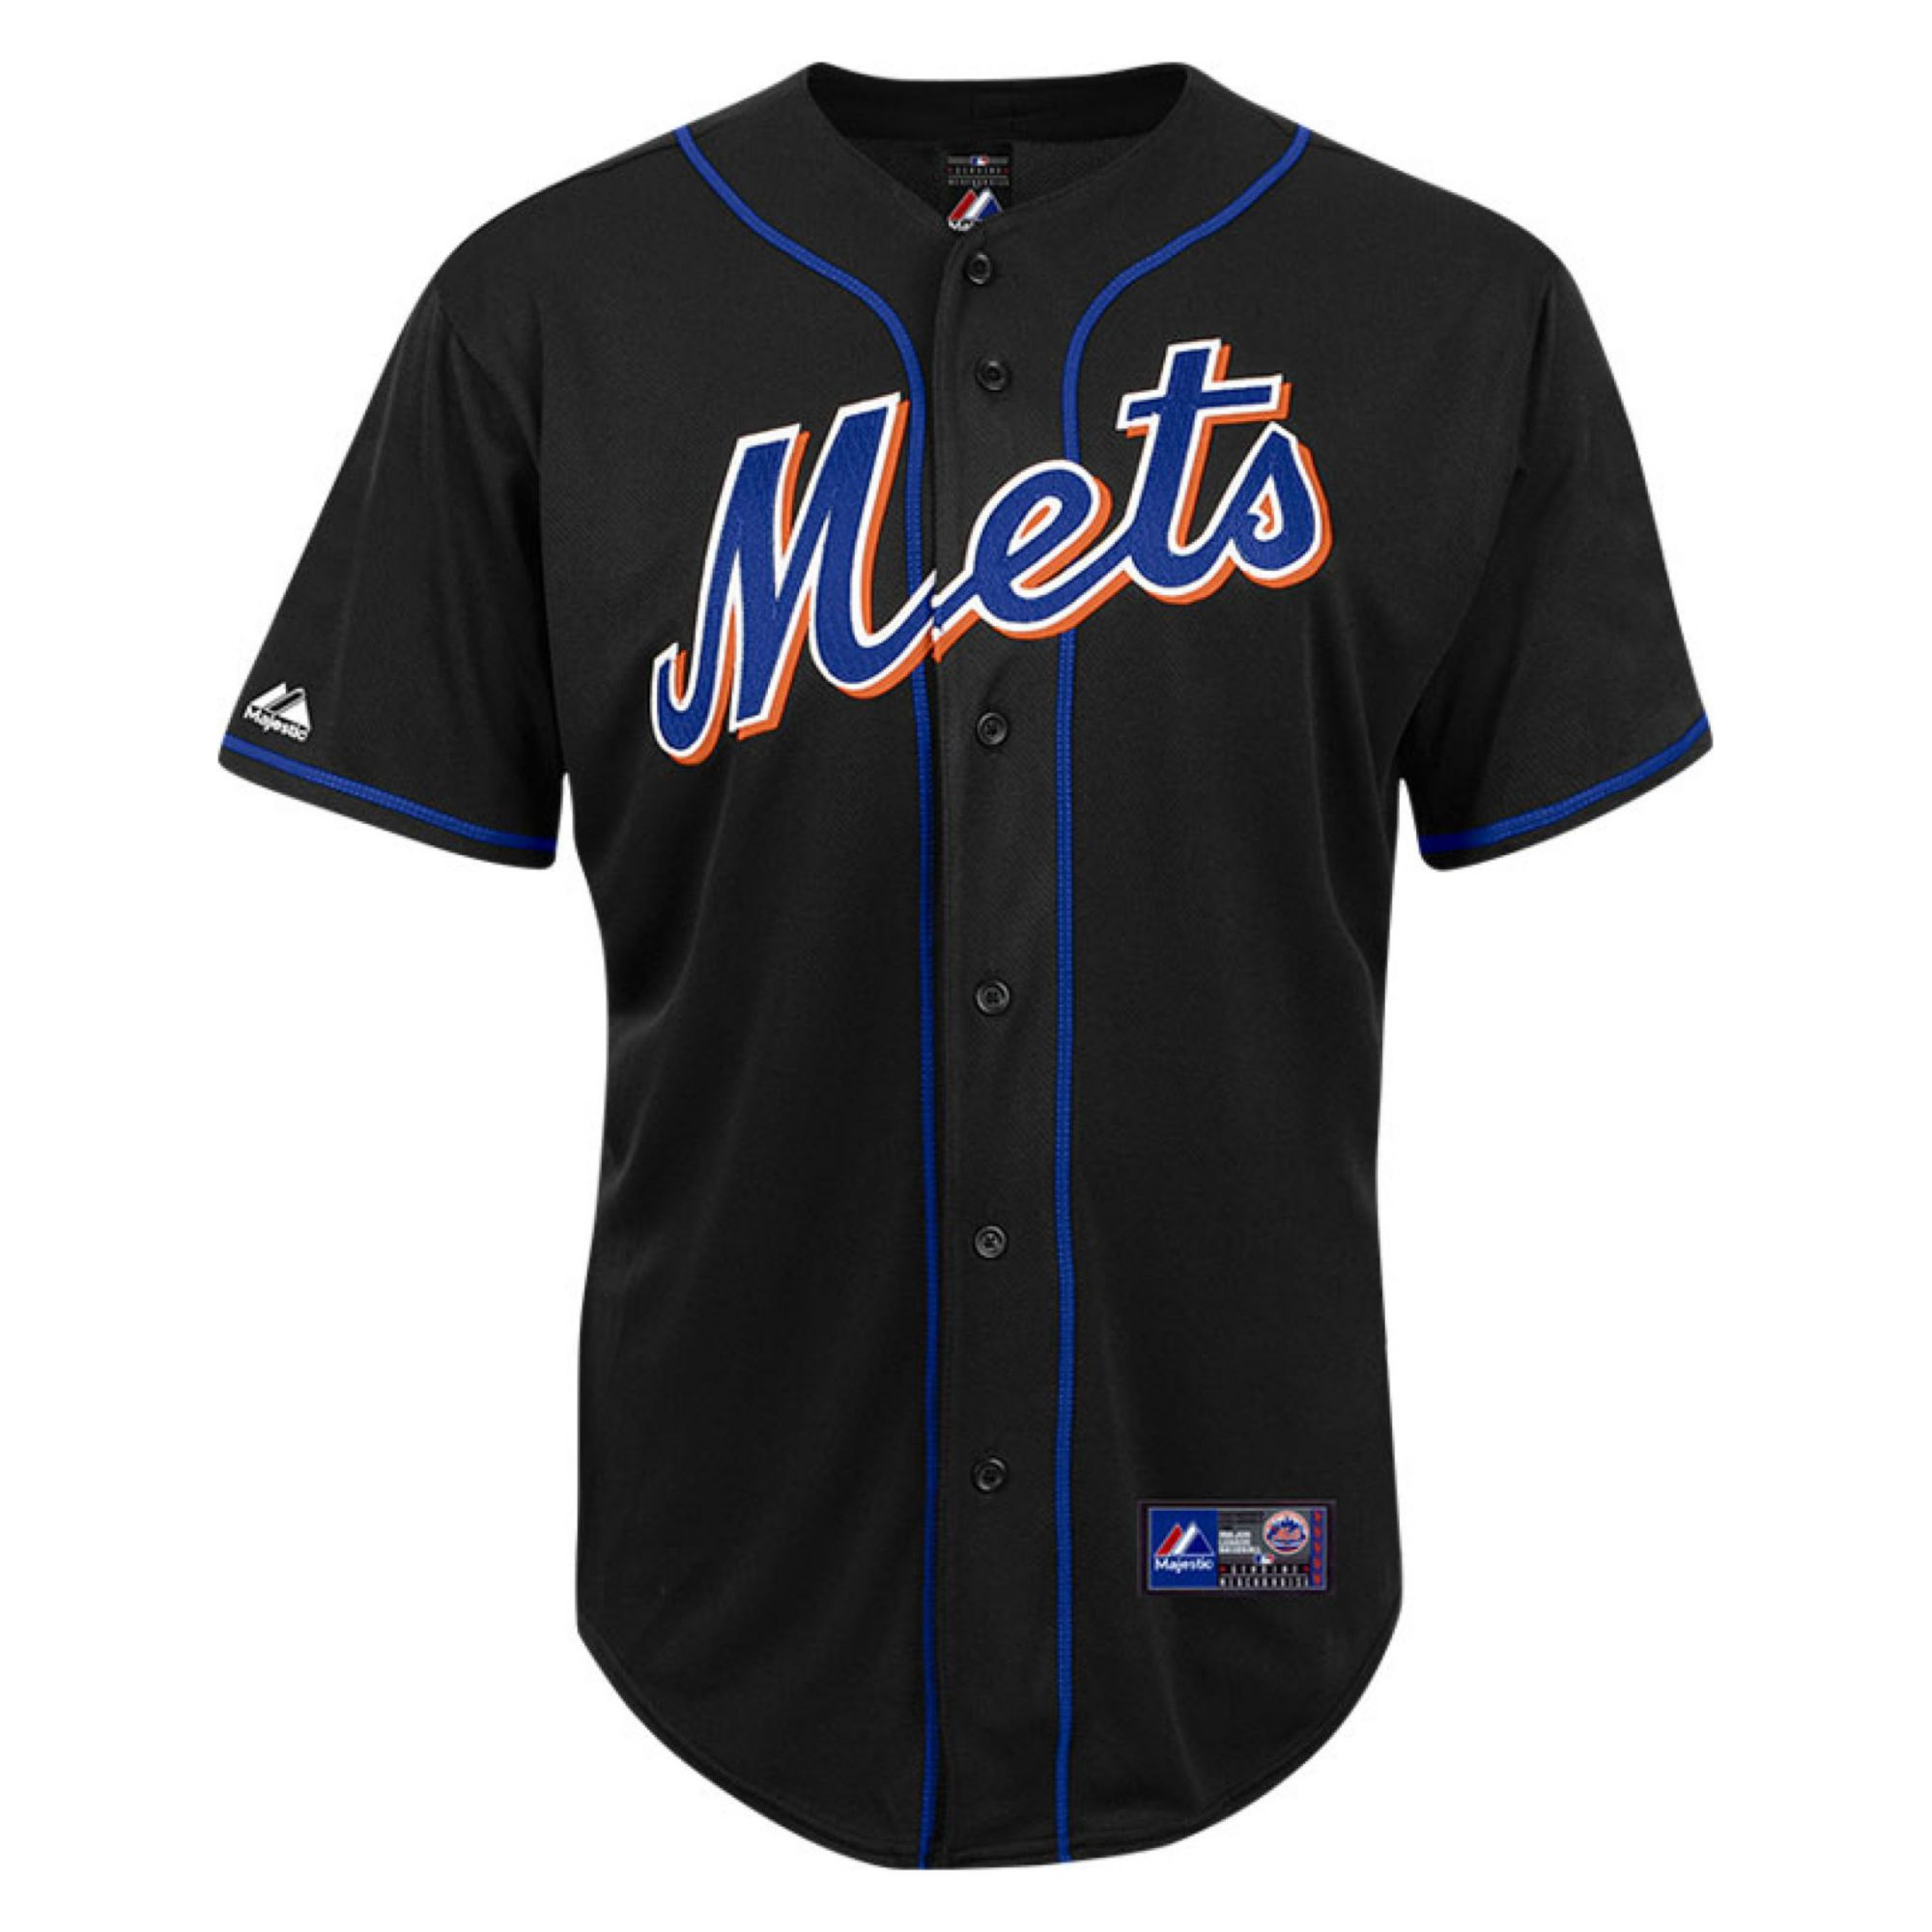 Majestic Men S New York Mets Blank Replica Jersey In Black For Men Lyst